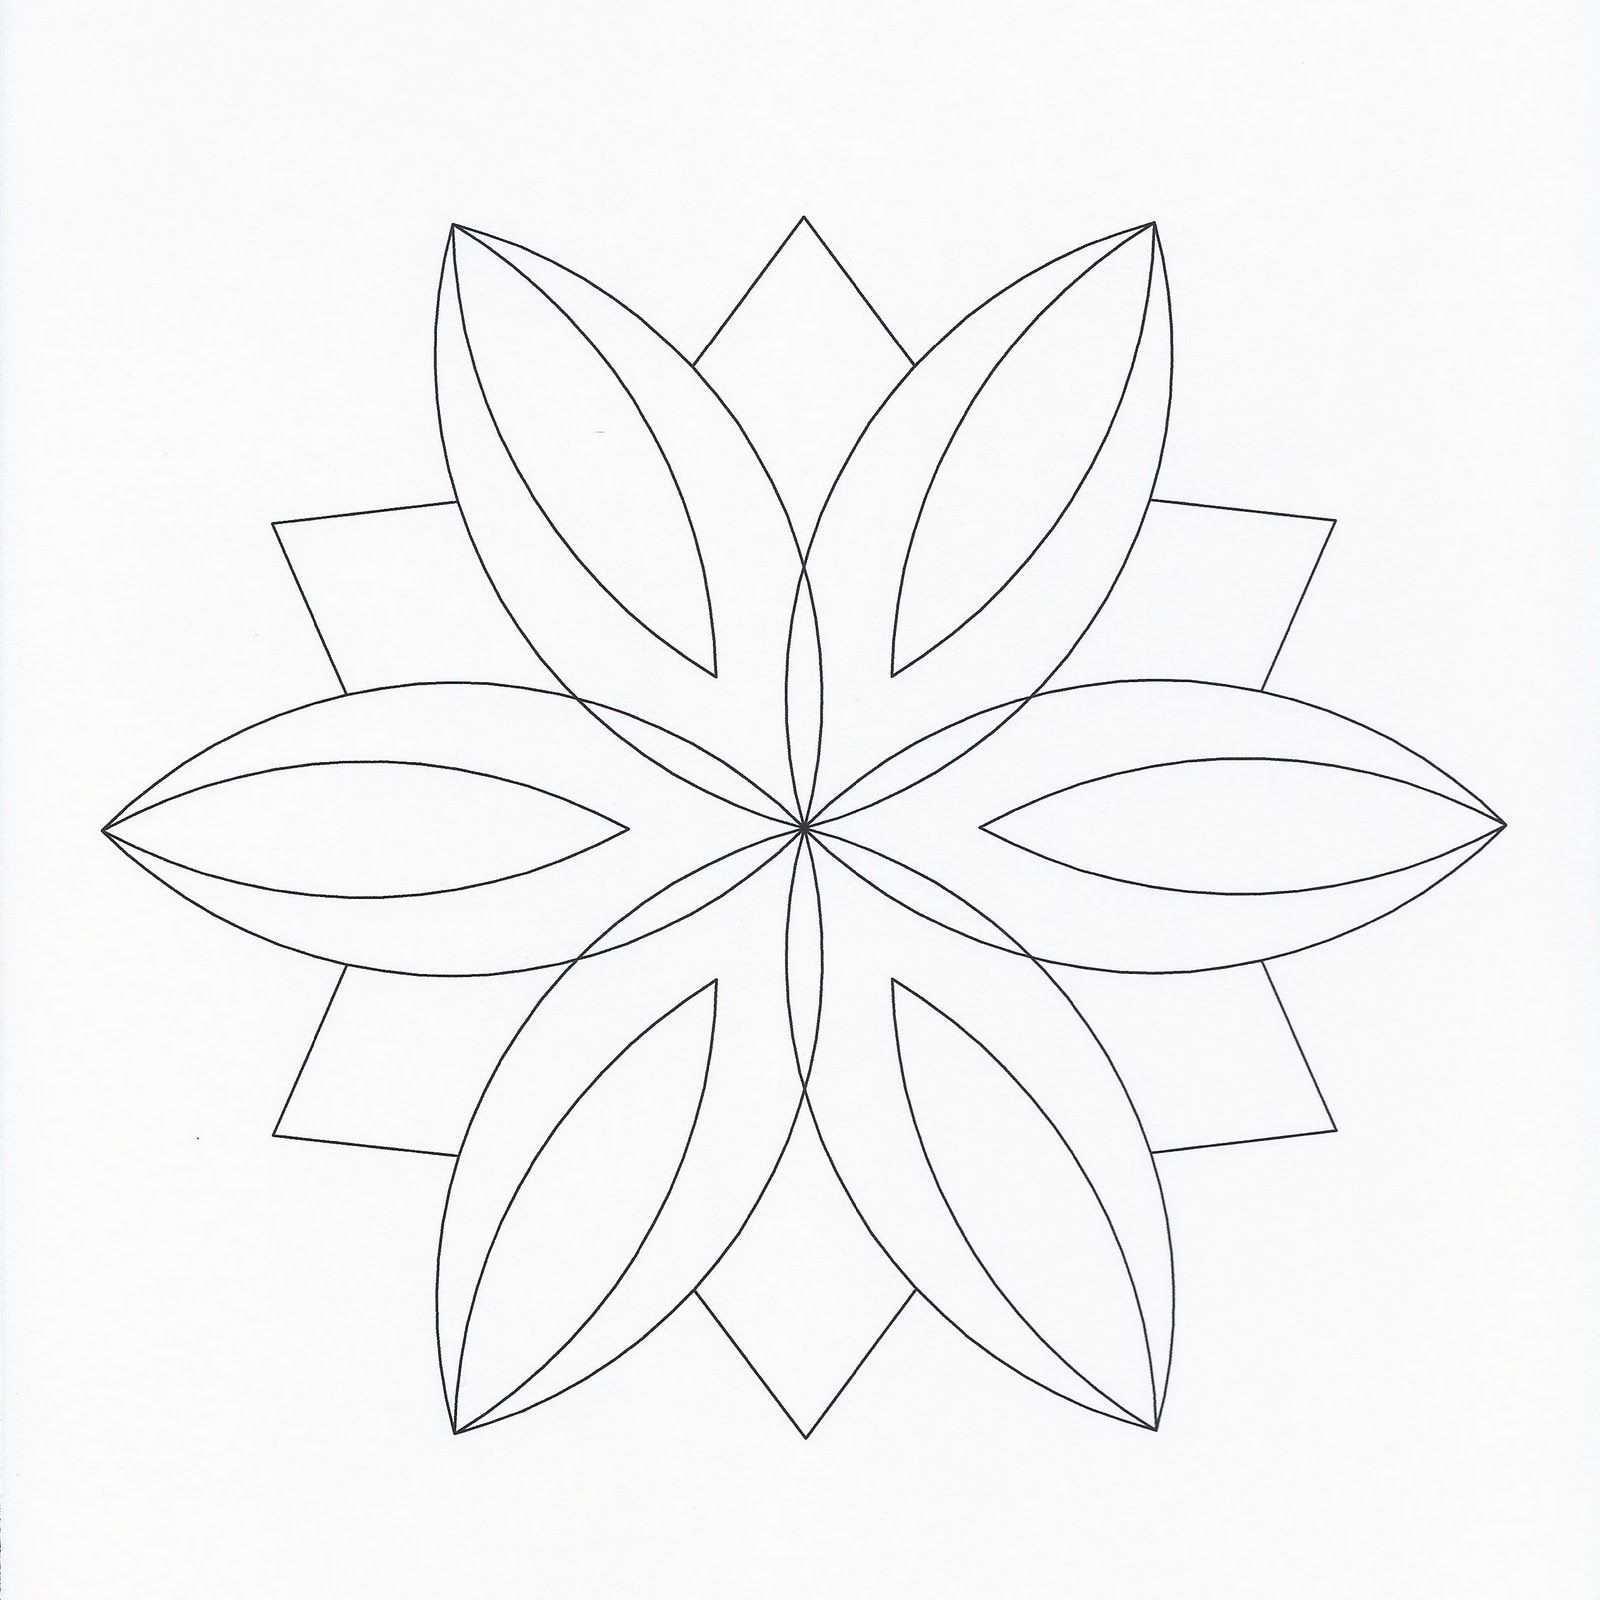 Mandala Templates Einfaches Mandala Zentangle Vorlagen Mandala Muster